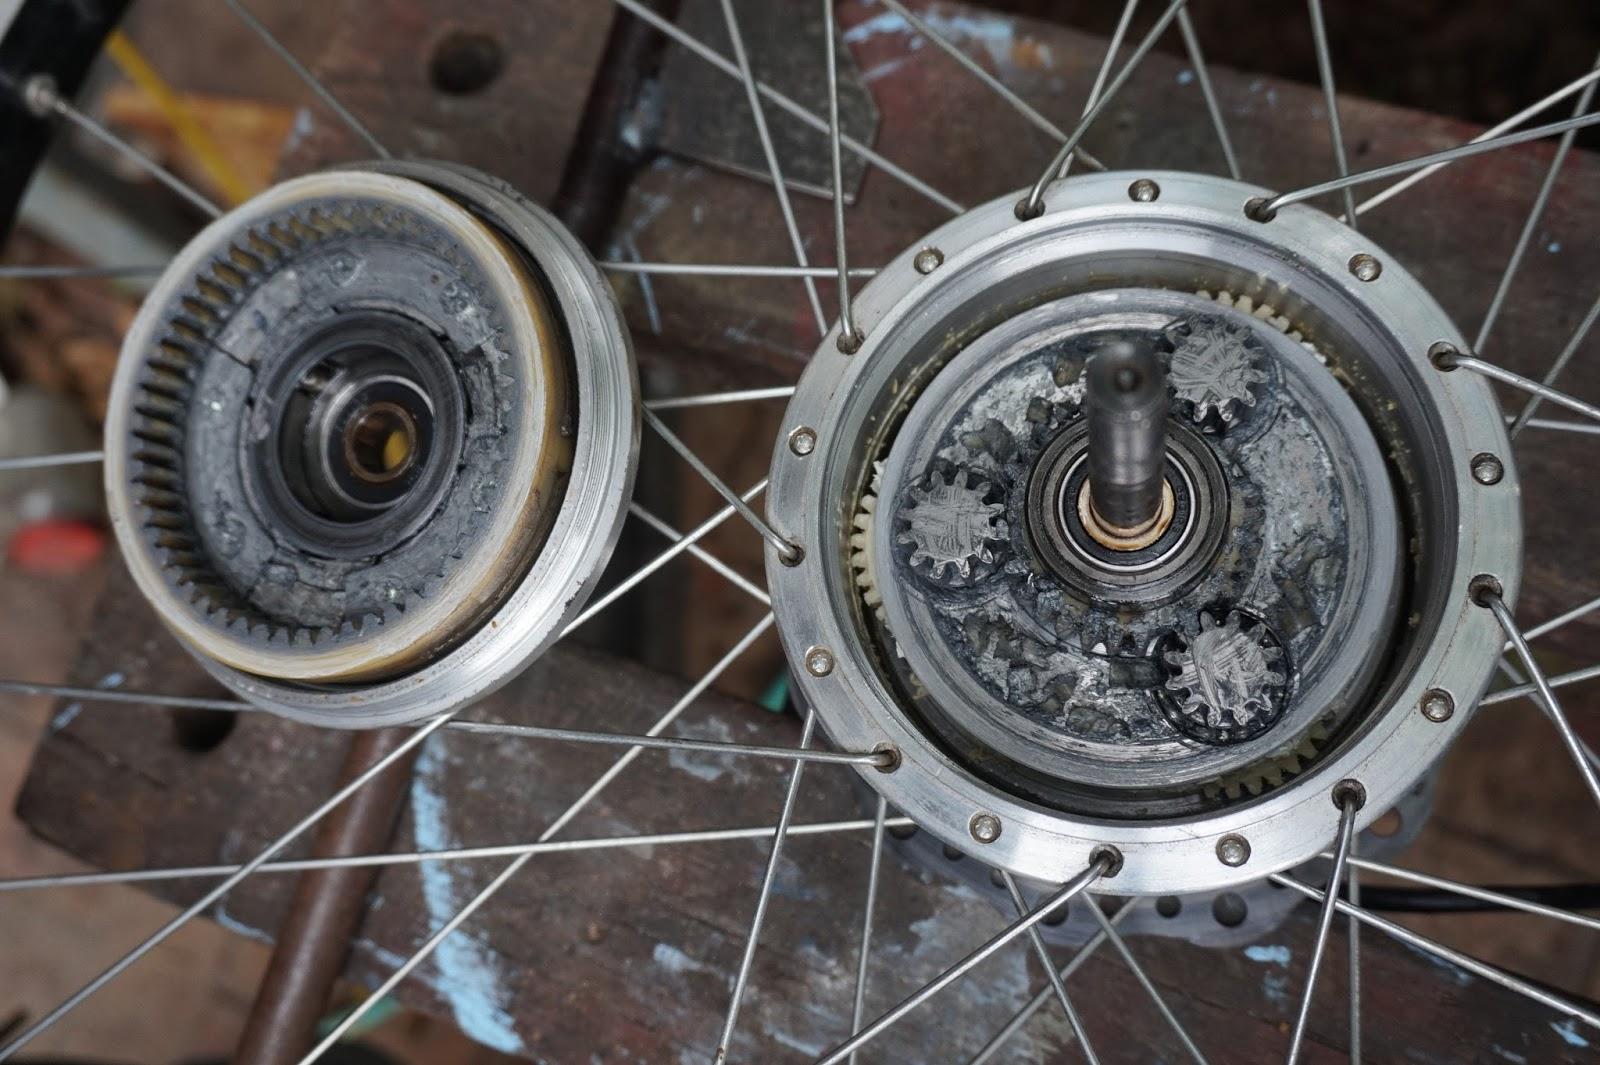 Bruce teakle 39 s pages xiongda 2 speed motor repair nylon for Electric bike hub motor planetary gear